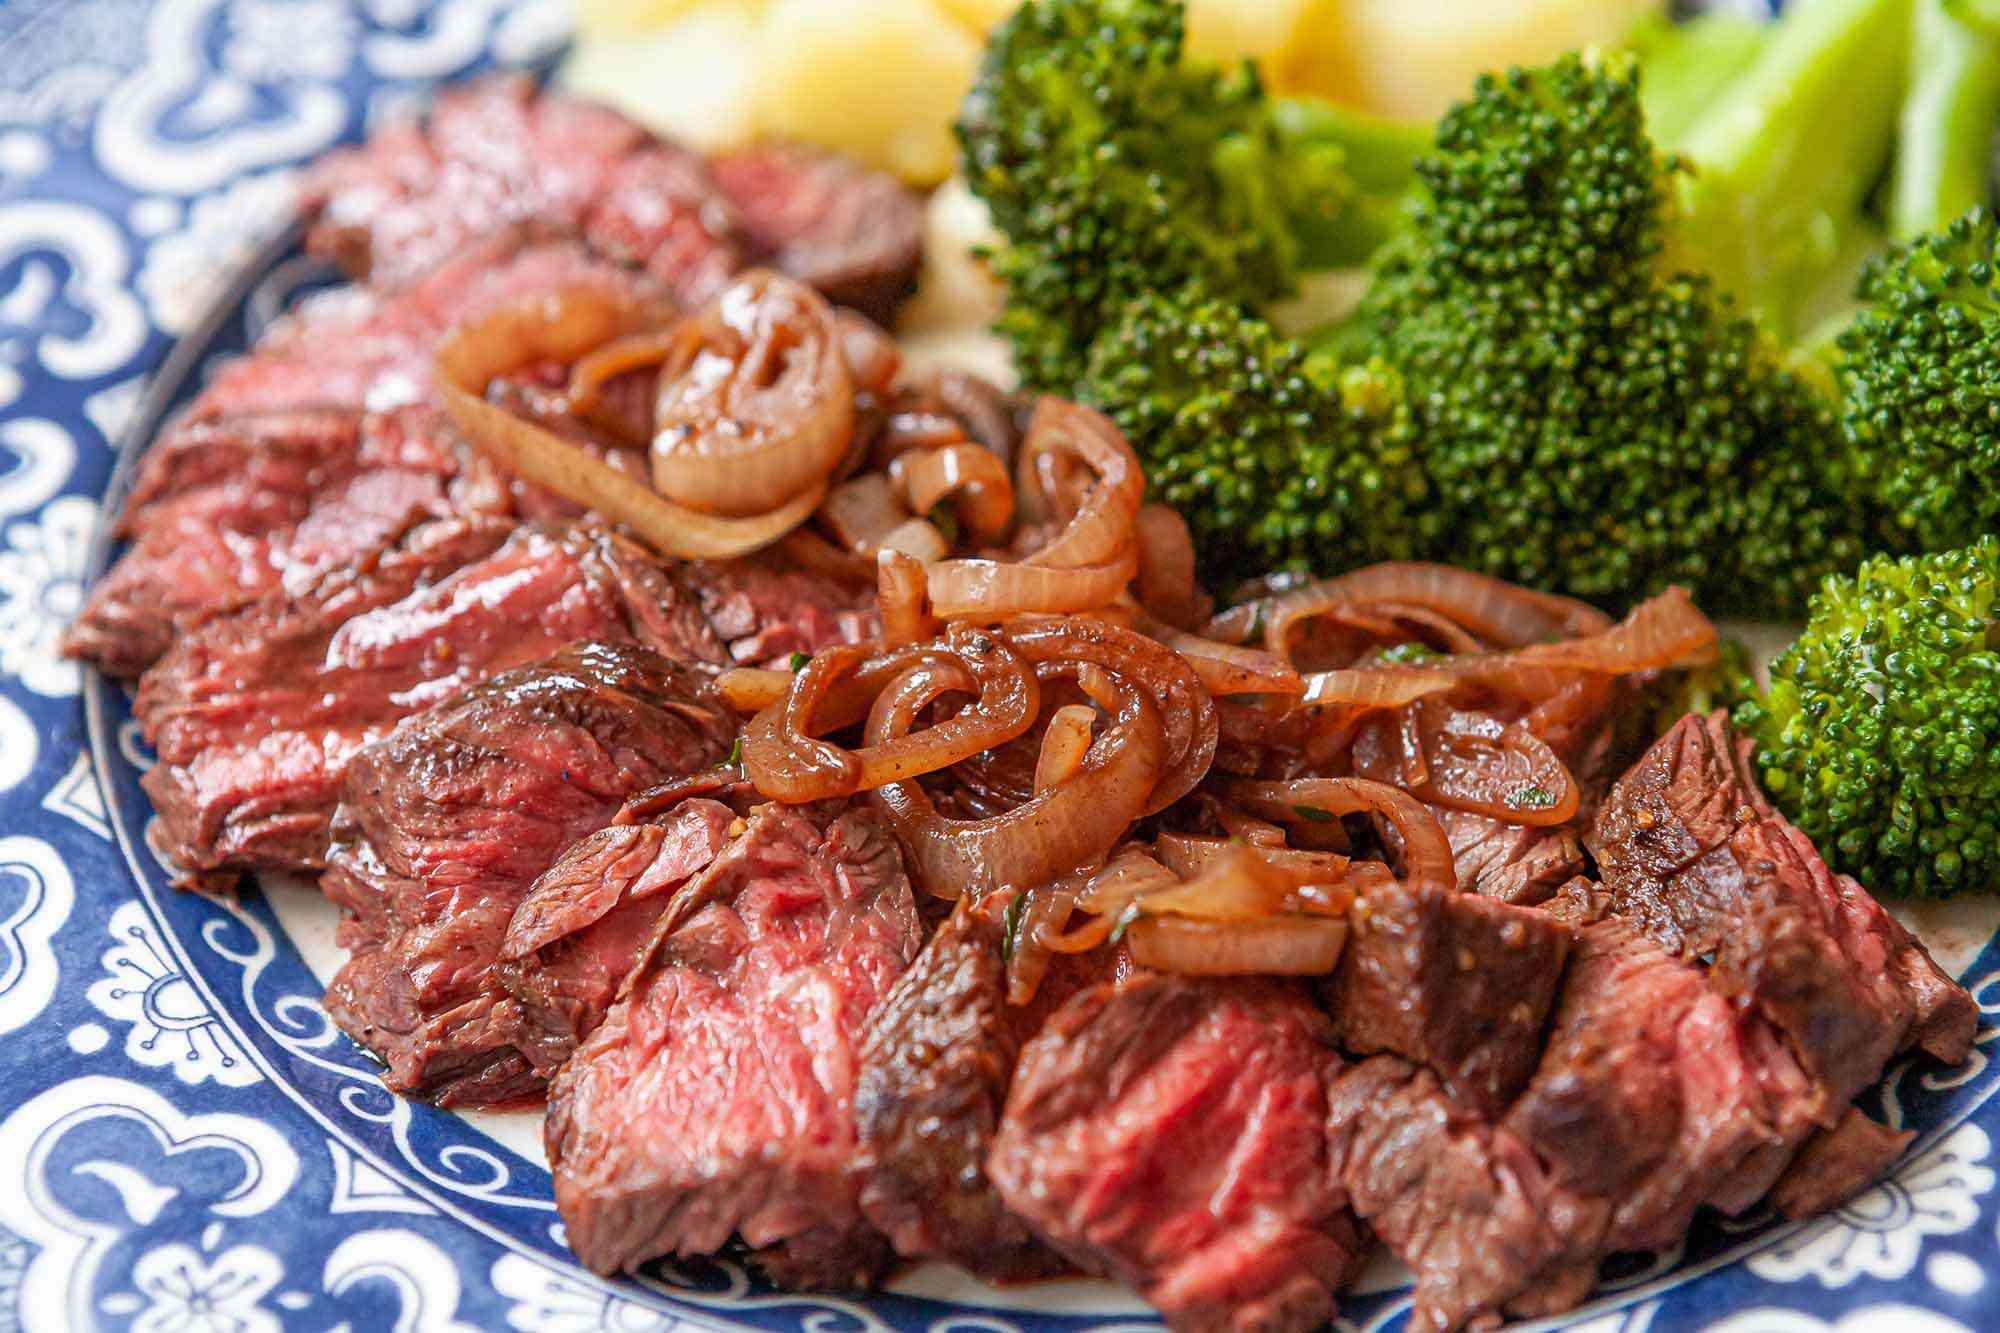 Stovetop Hanger Steak with shallots on a platter for serving